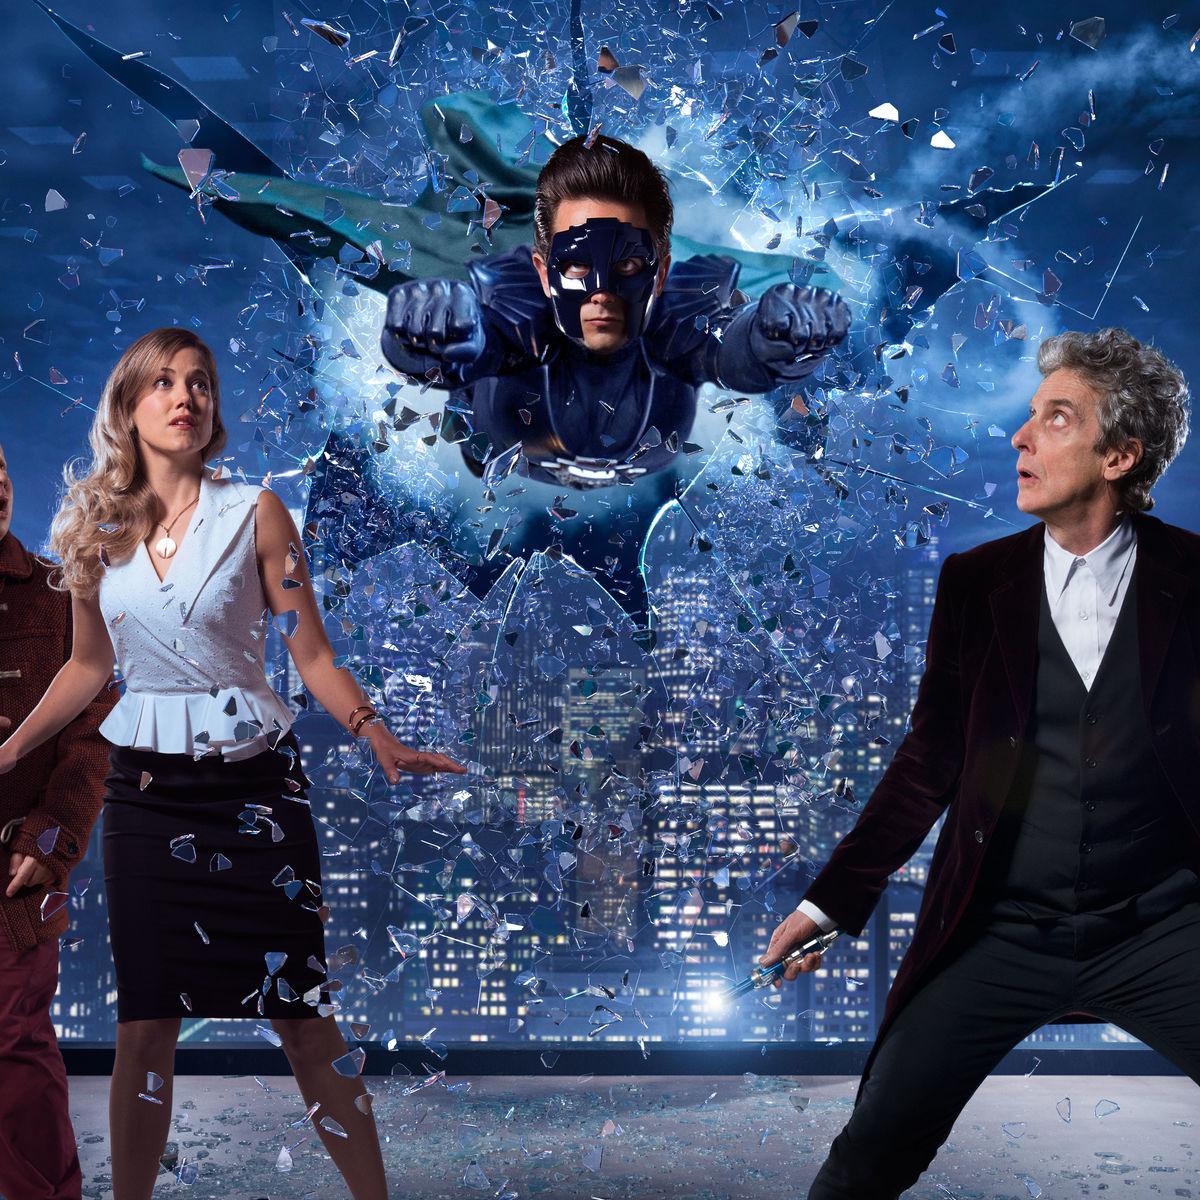 Doctor-Who-The-Return-of-Doctor-Mysterio.jpg